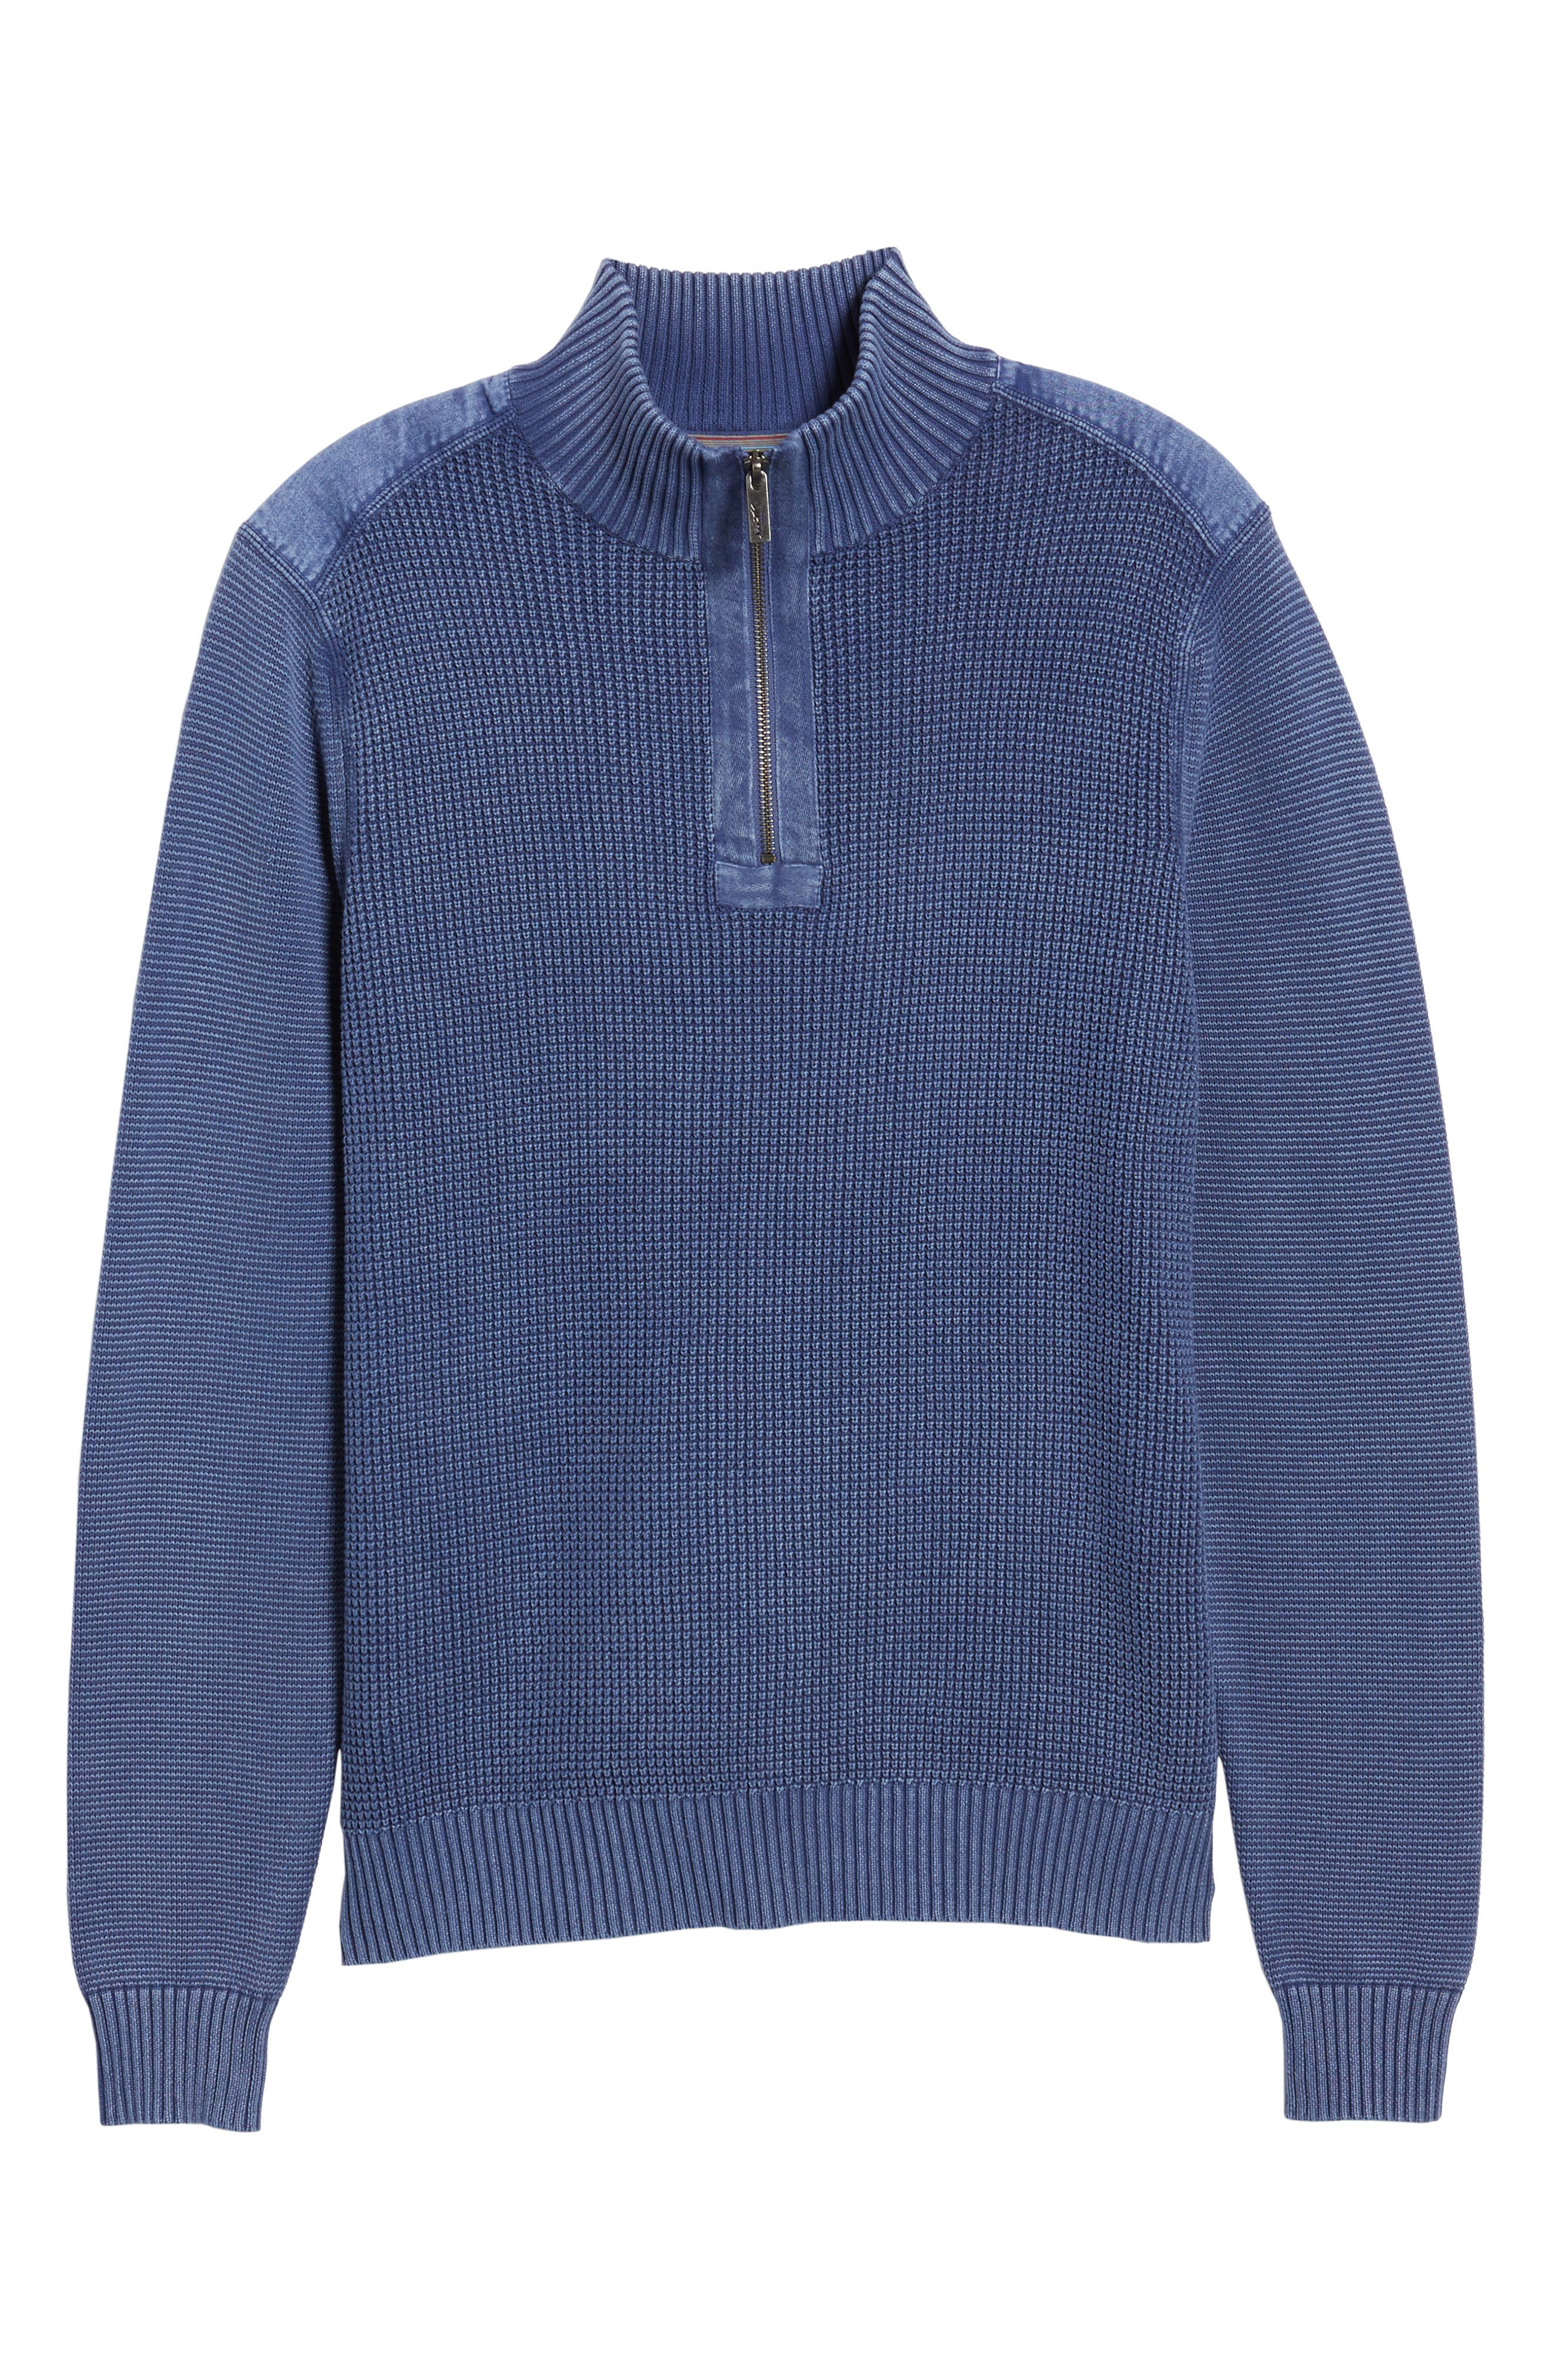 Coastal Shores Quarter Zip Sweater,                             Alternate thumbnail 33, color,